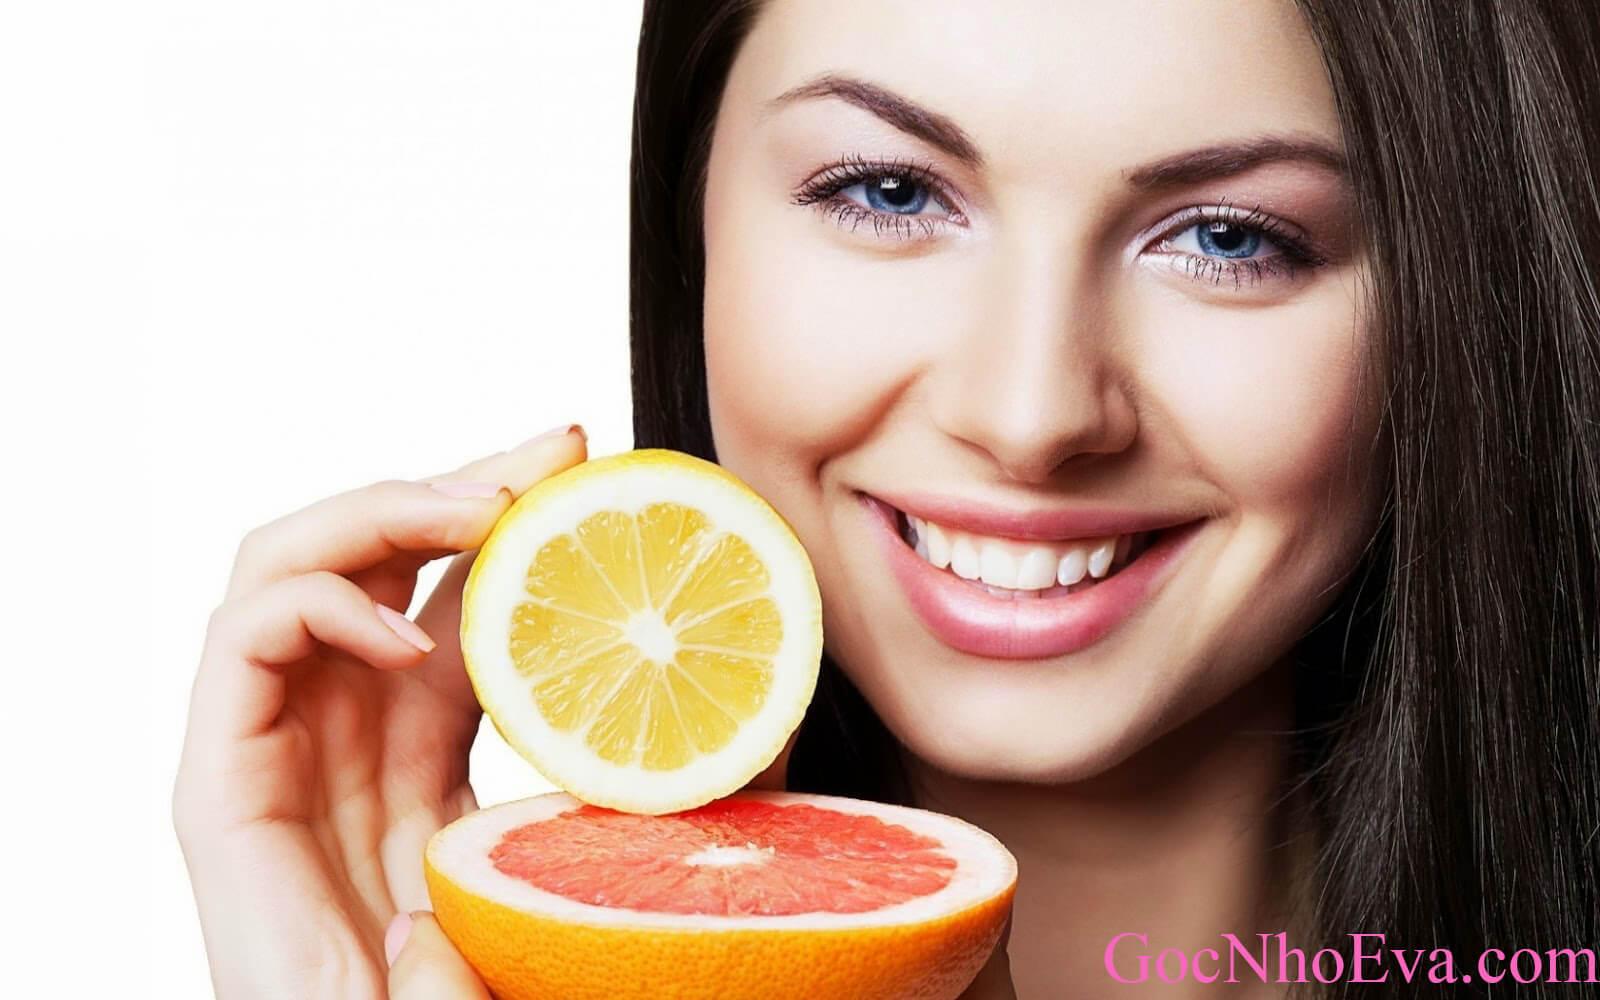 Thuốc uống đẹp da chống lão hóa - Vitamin C